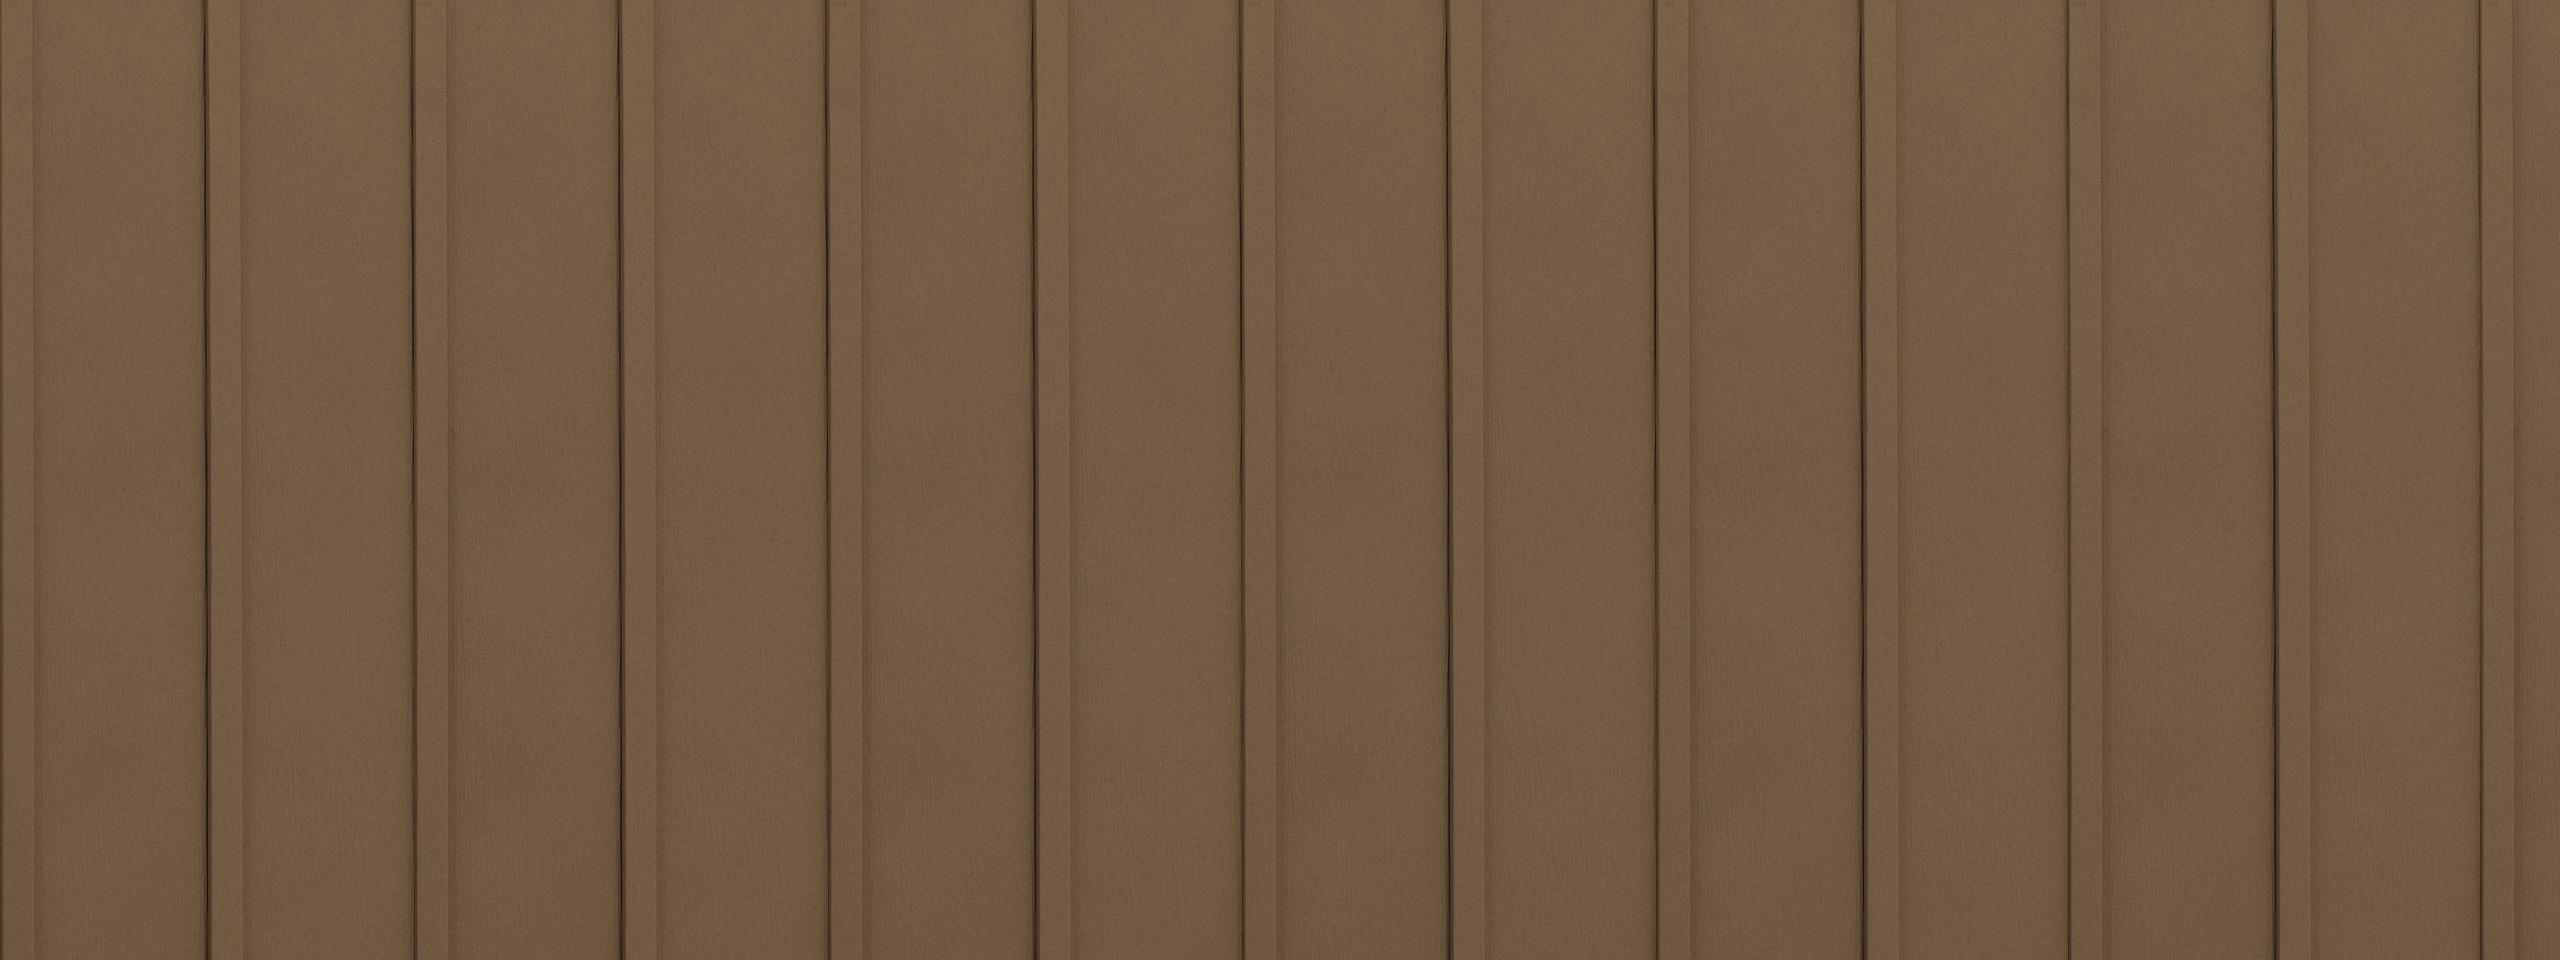 Entex vertical cedarwood board and batten steel siding